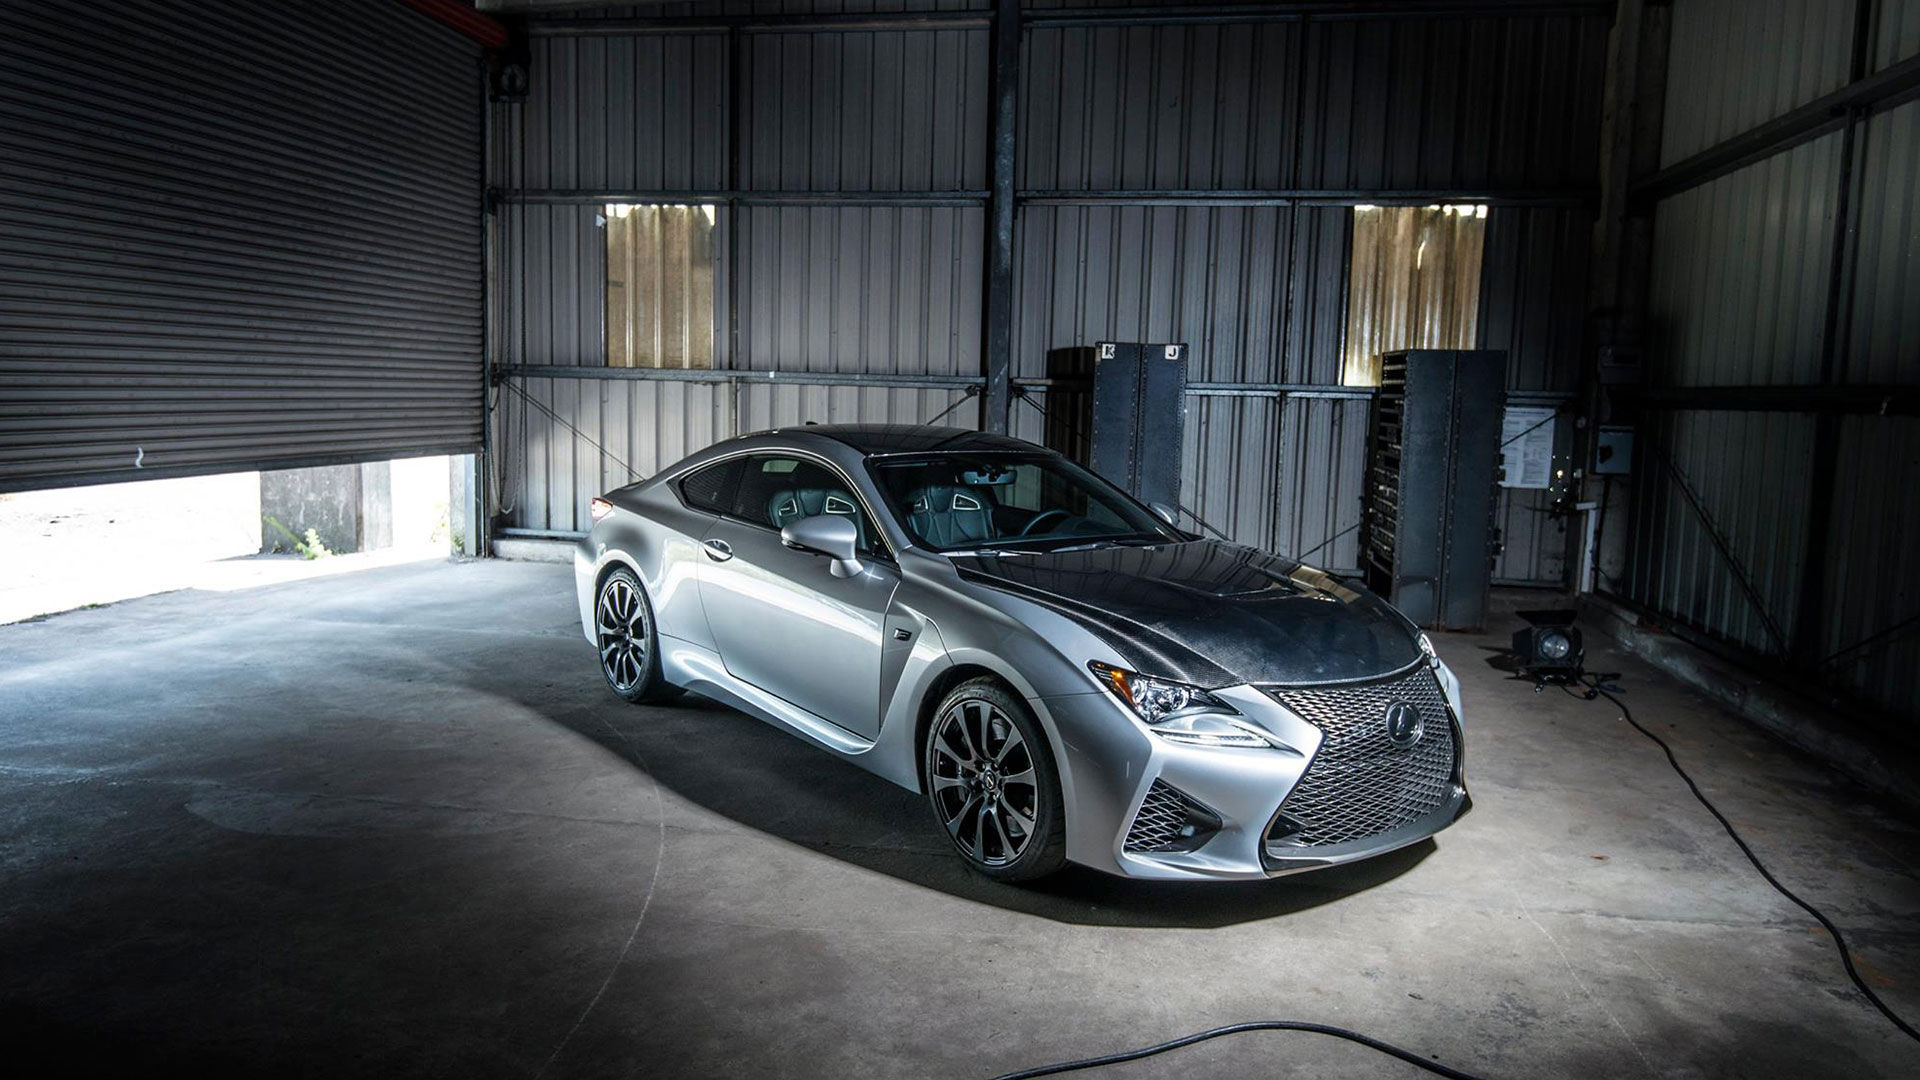 Lexus RC F hero asset